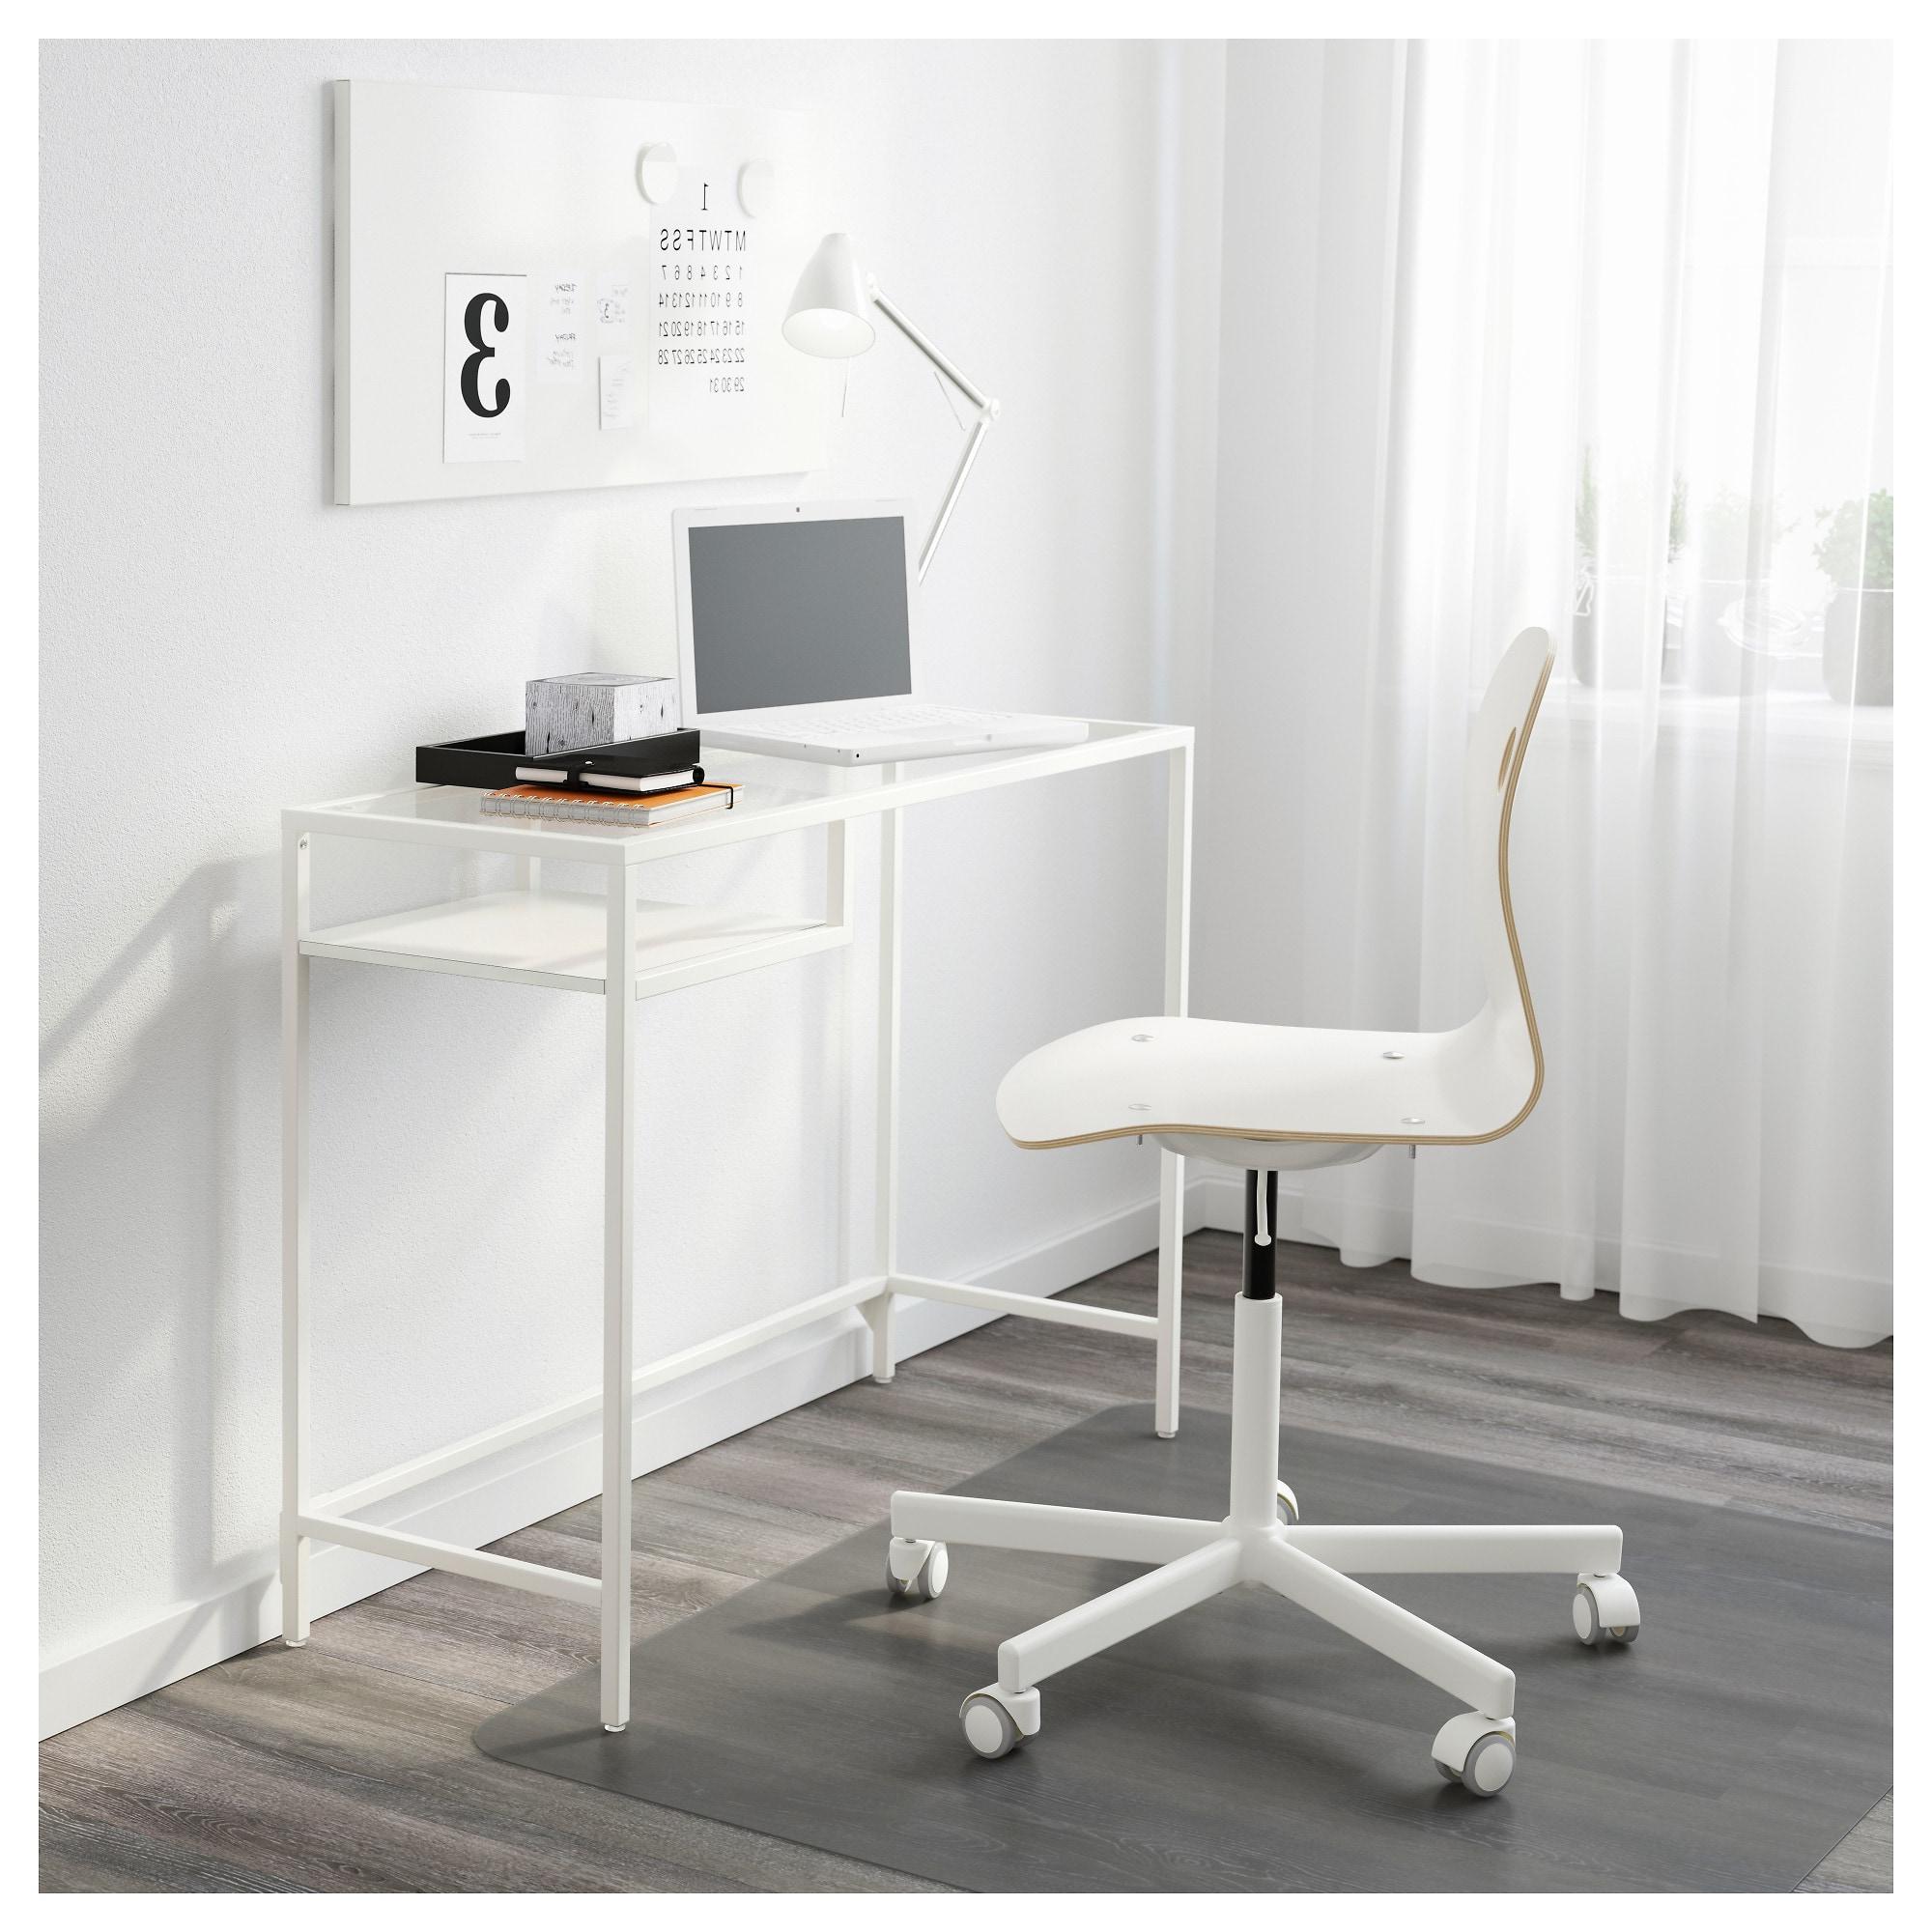 Mesa Portatil Whdr Vittsjà Mesa Para Portà Til Blanco Vidrio 100 X 36 Cm Ikea